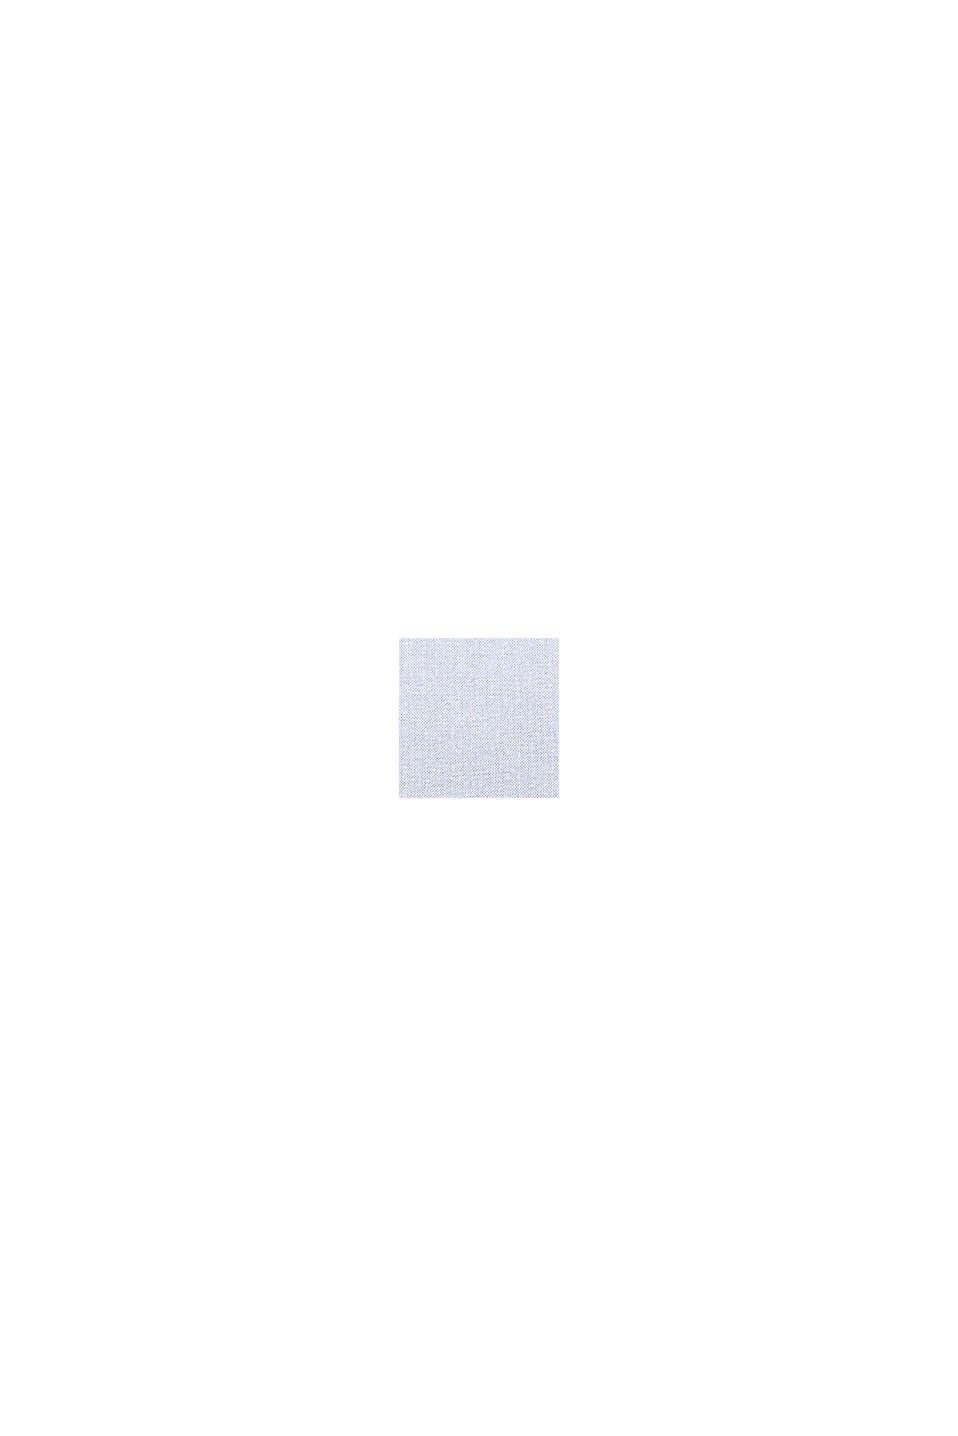 Tričko s přechodem barev, 100% bavlna, WHITE, swatch